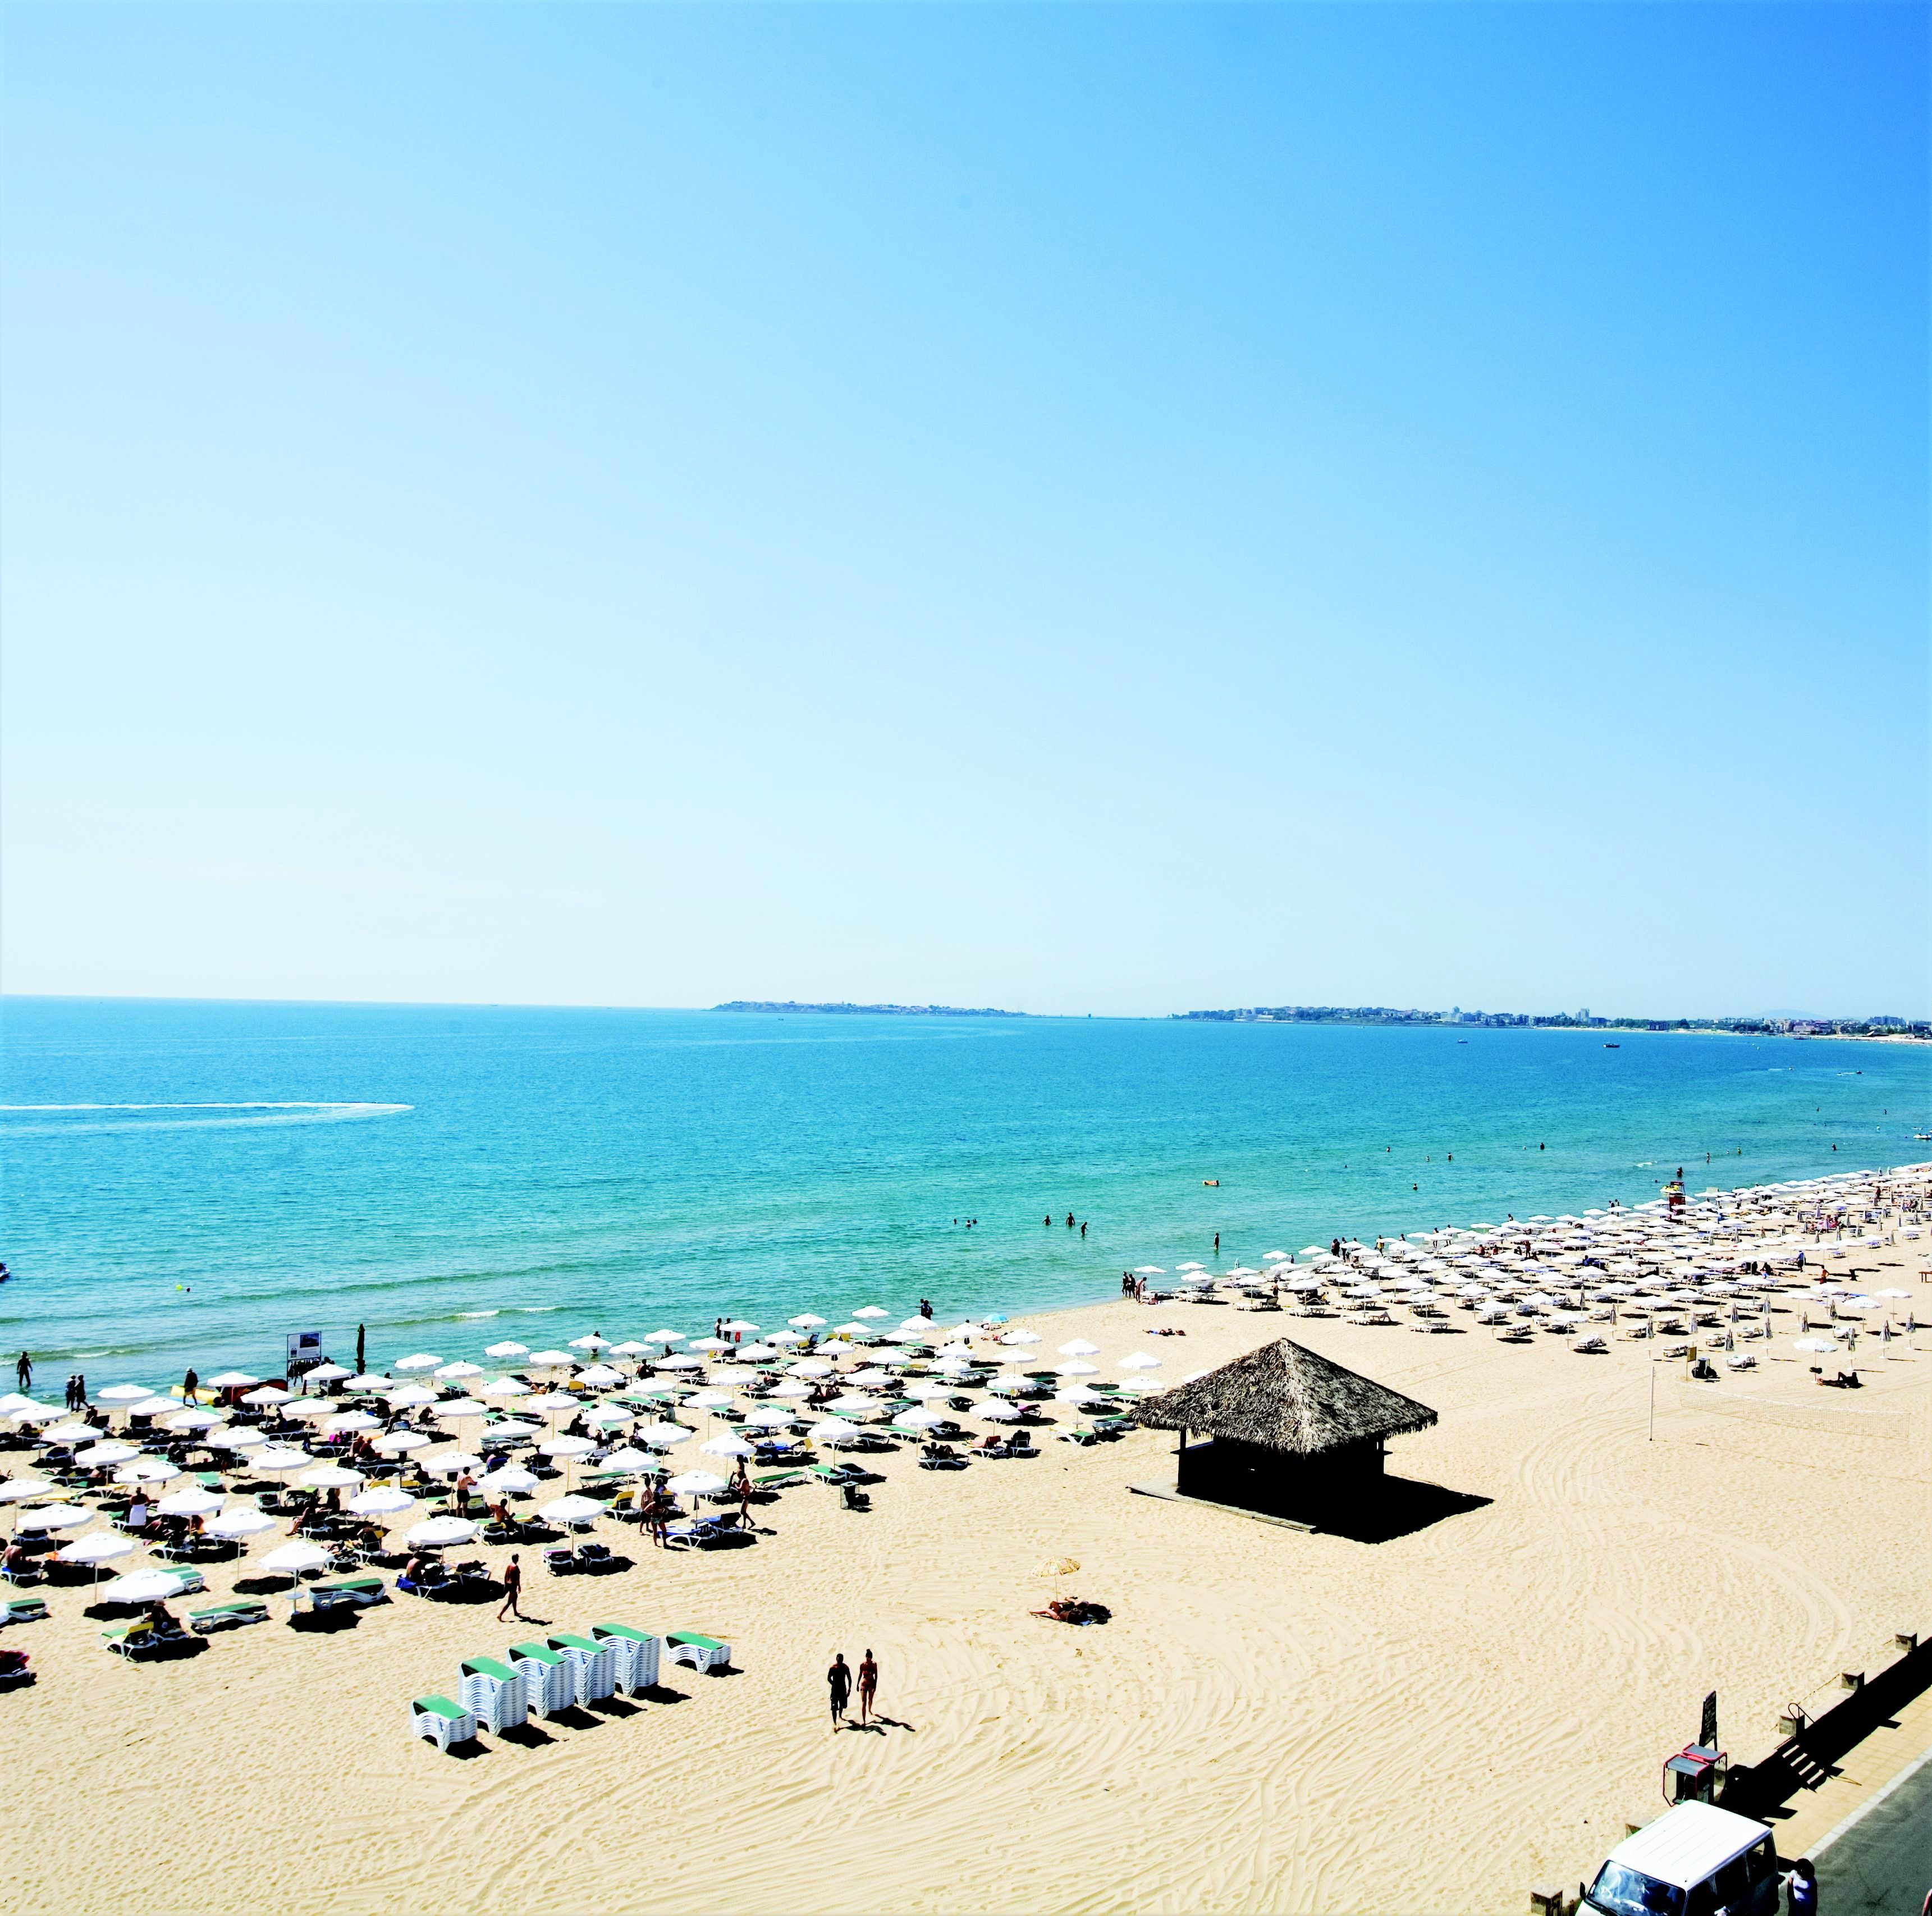 Bulgarien Urlaub Evrika Beach Club Strand Sandstrand